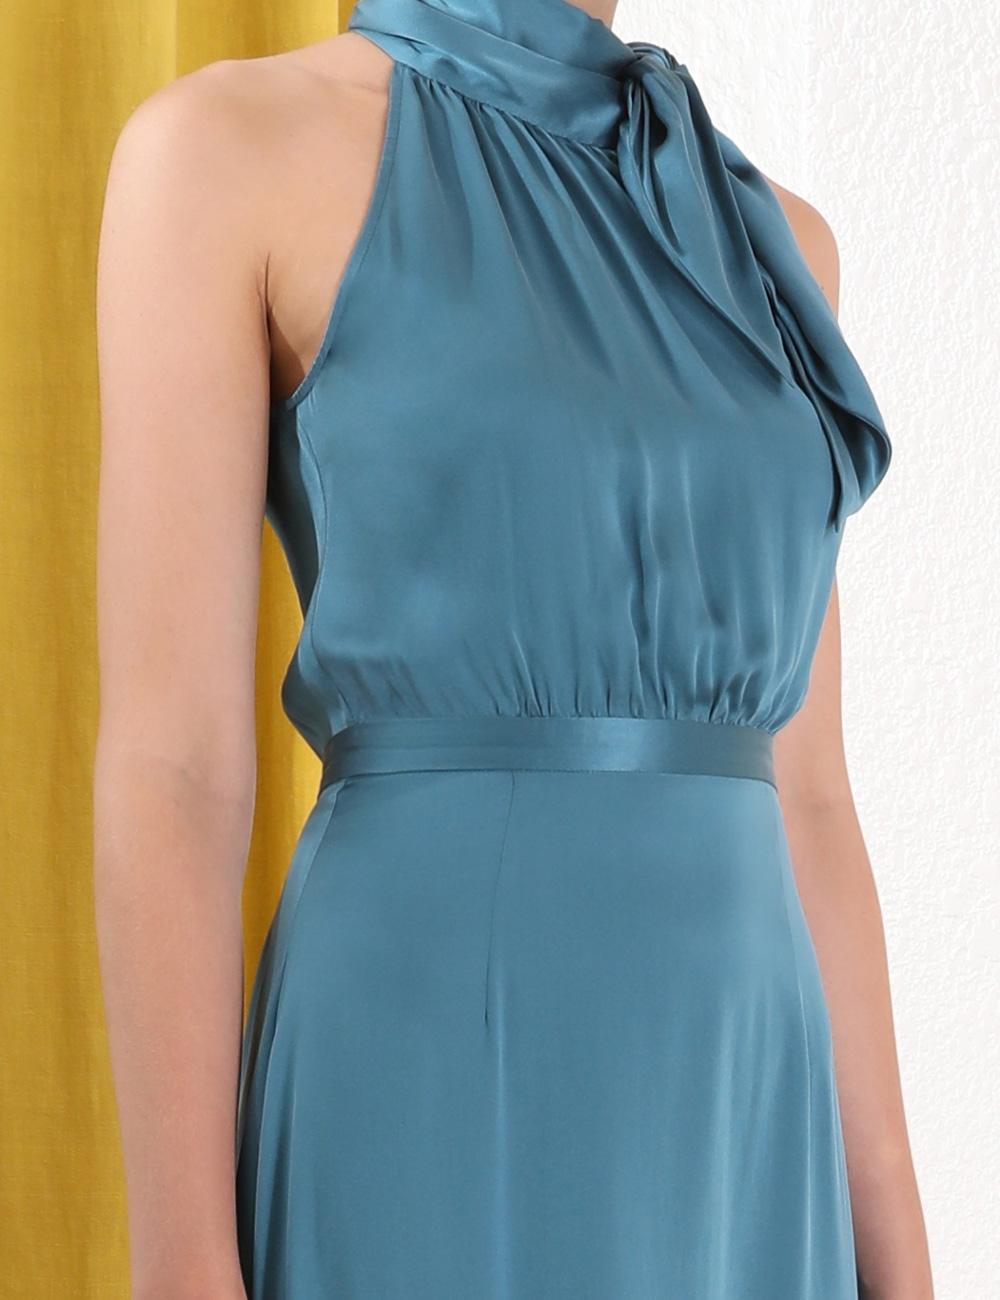 Necktie Picnic Dress